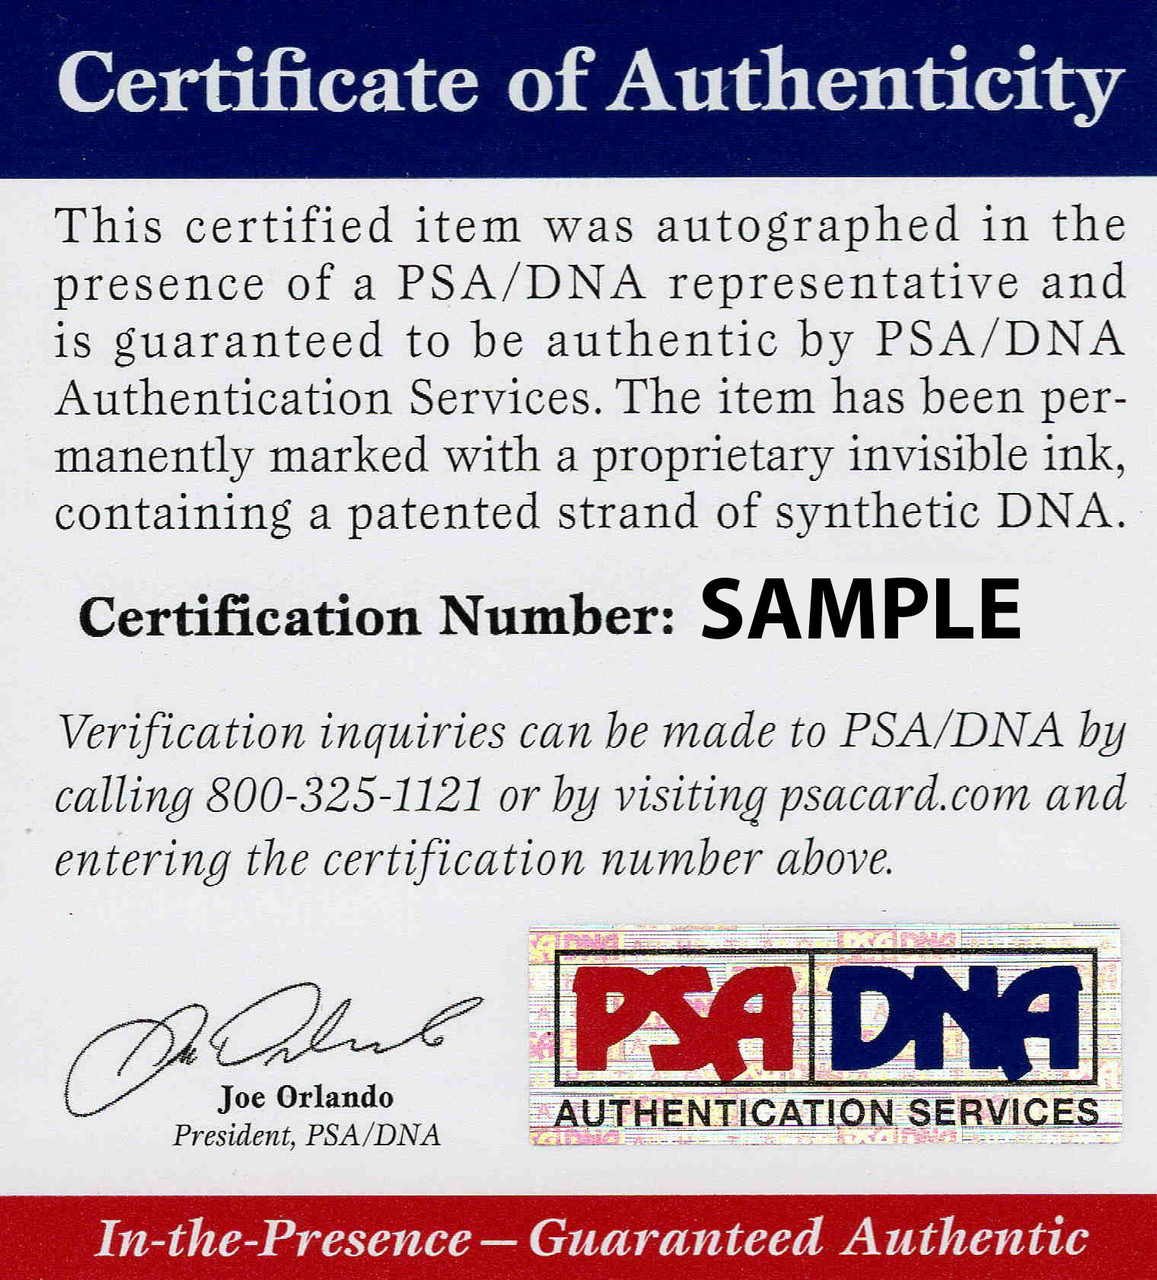 Phil Dawson Cleveland Browns Autographed Jersey - PSA Authentic